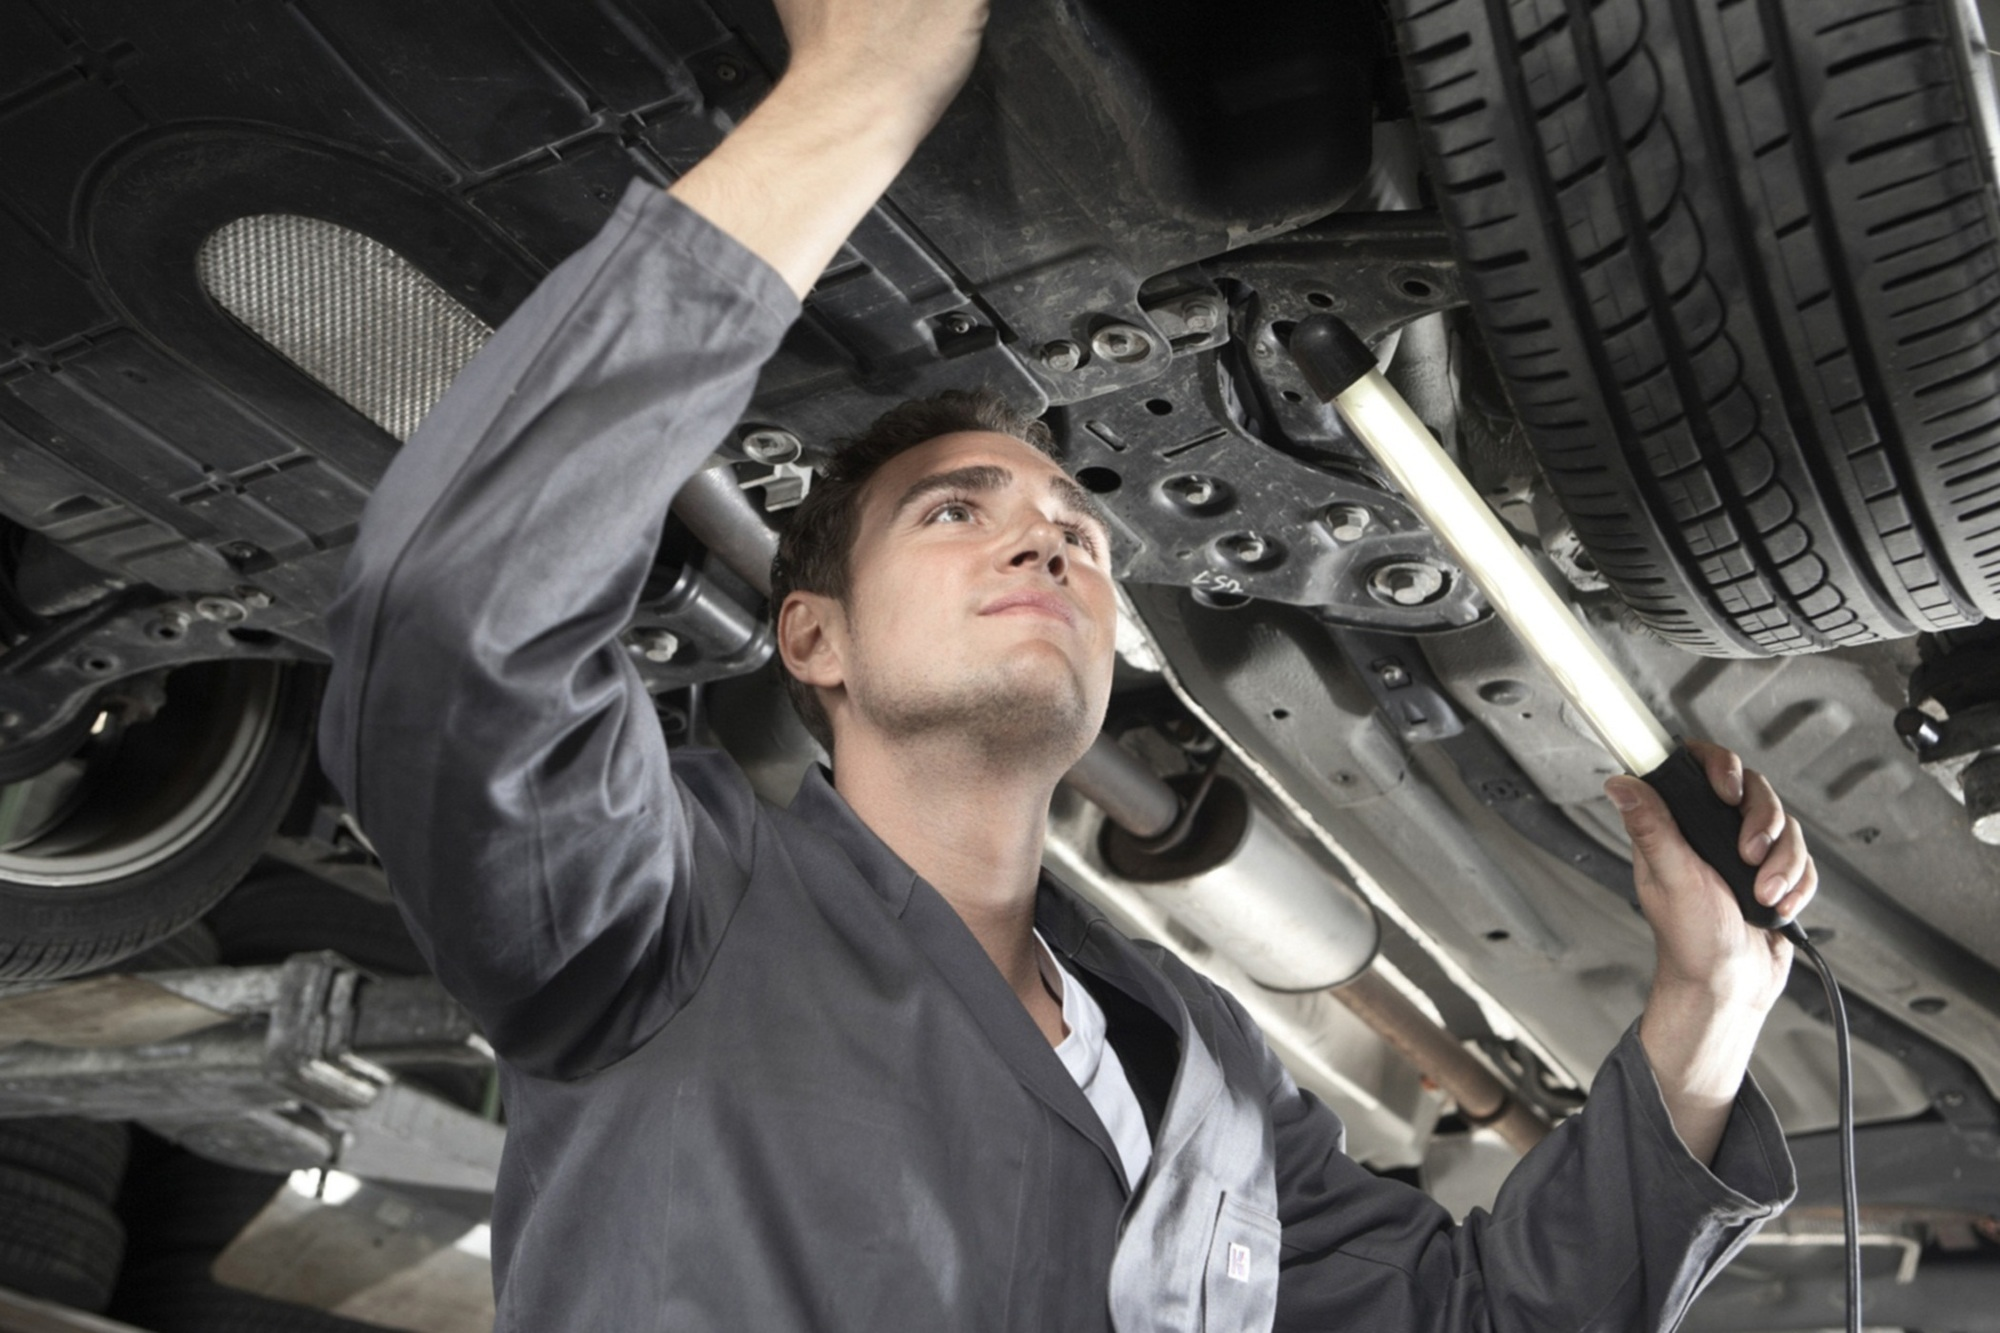 Recht: Do-it-yourself-Reparatur nach Unfall - Versicherung muss auch für Nutzungsausfall zahlen